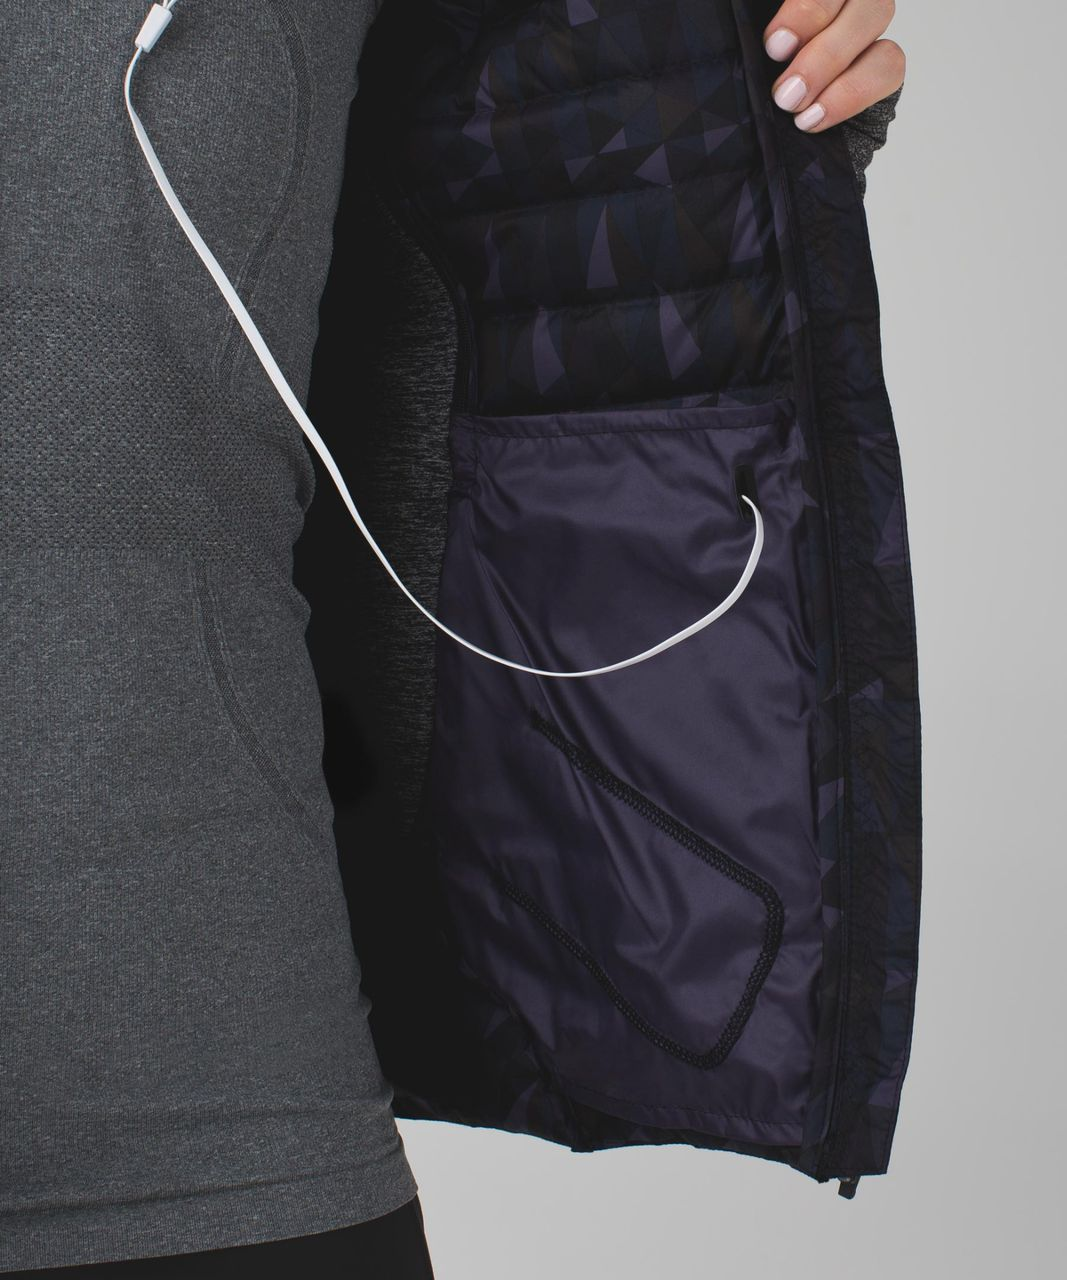 Lululemon Fluff Off Jacket - Stained Glass Love Nightfall Black